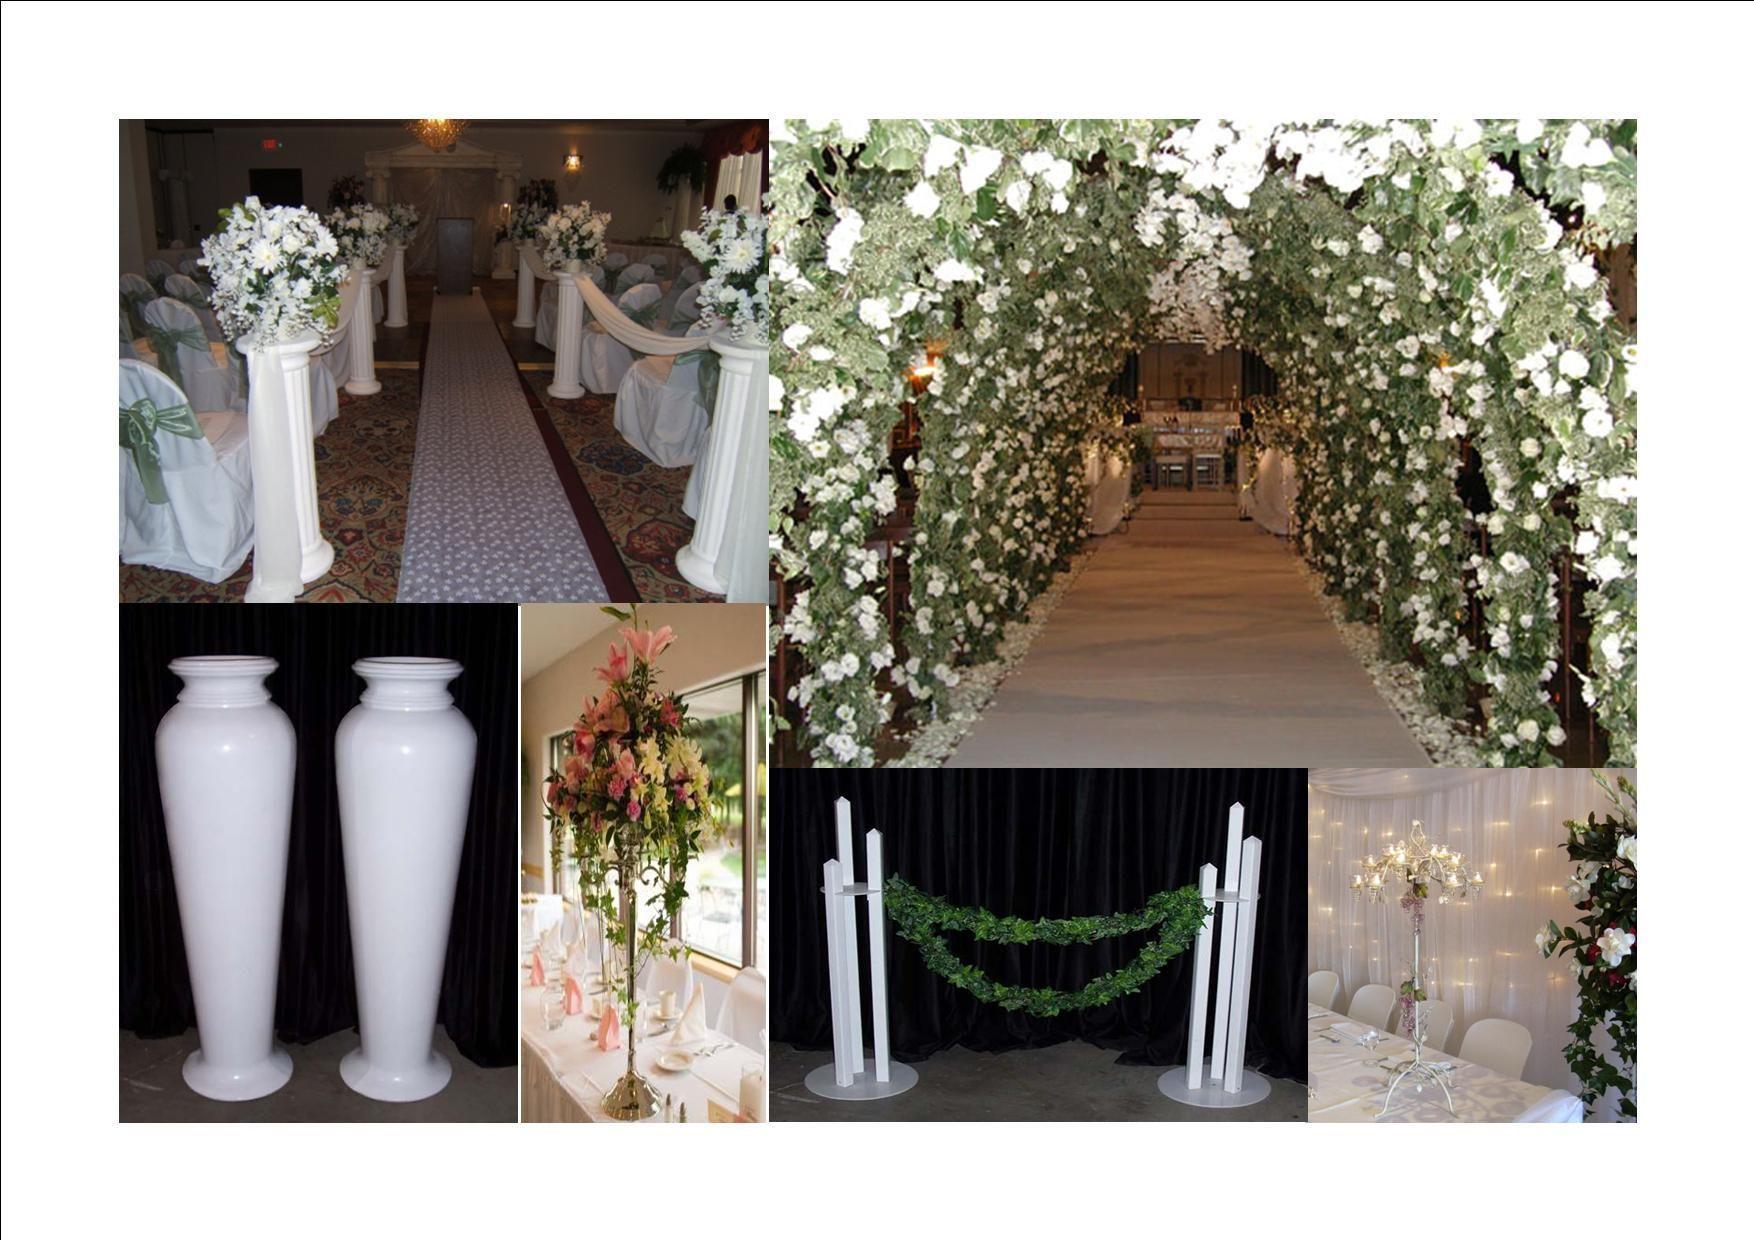 mariage location arche peinture. Black Bedroom Furniture Sets. Home Design Ideas